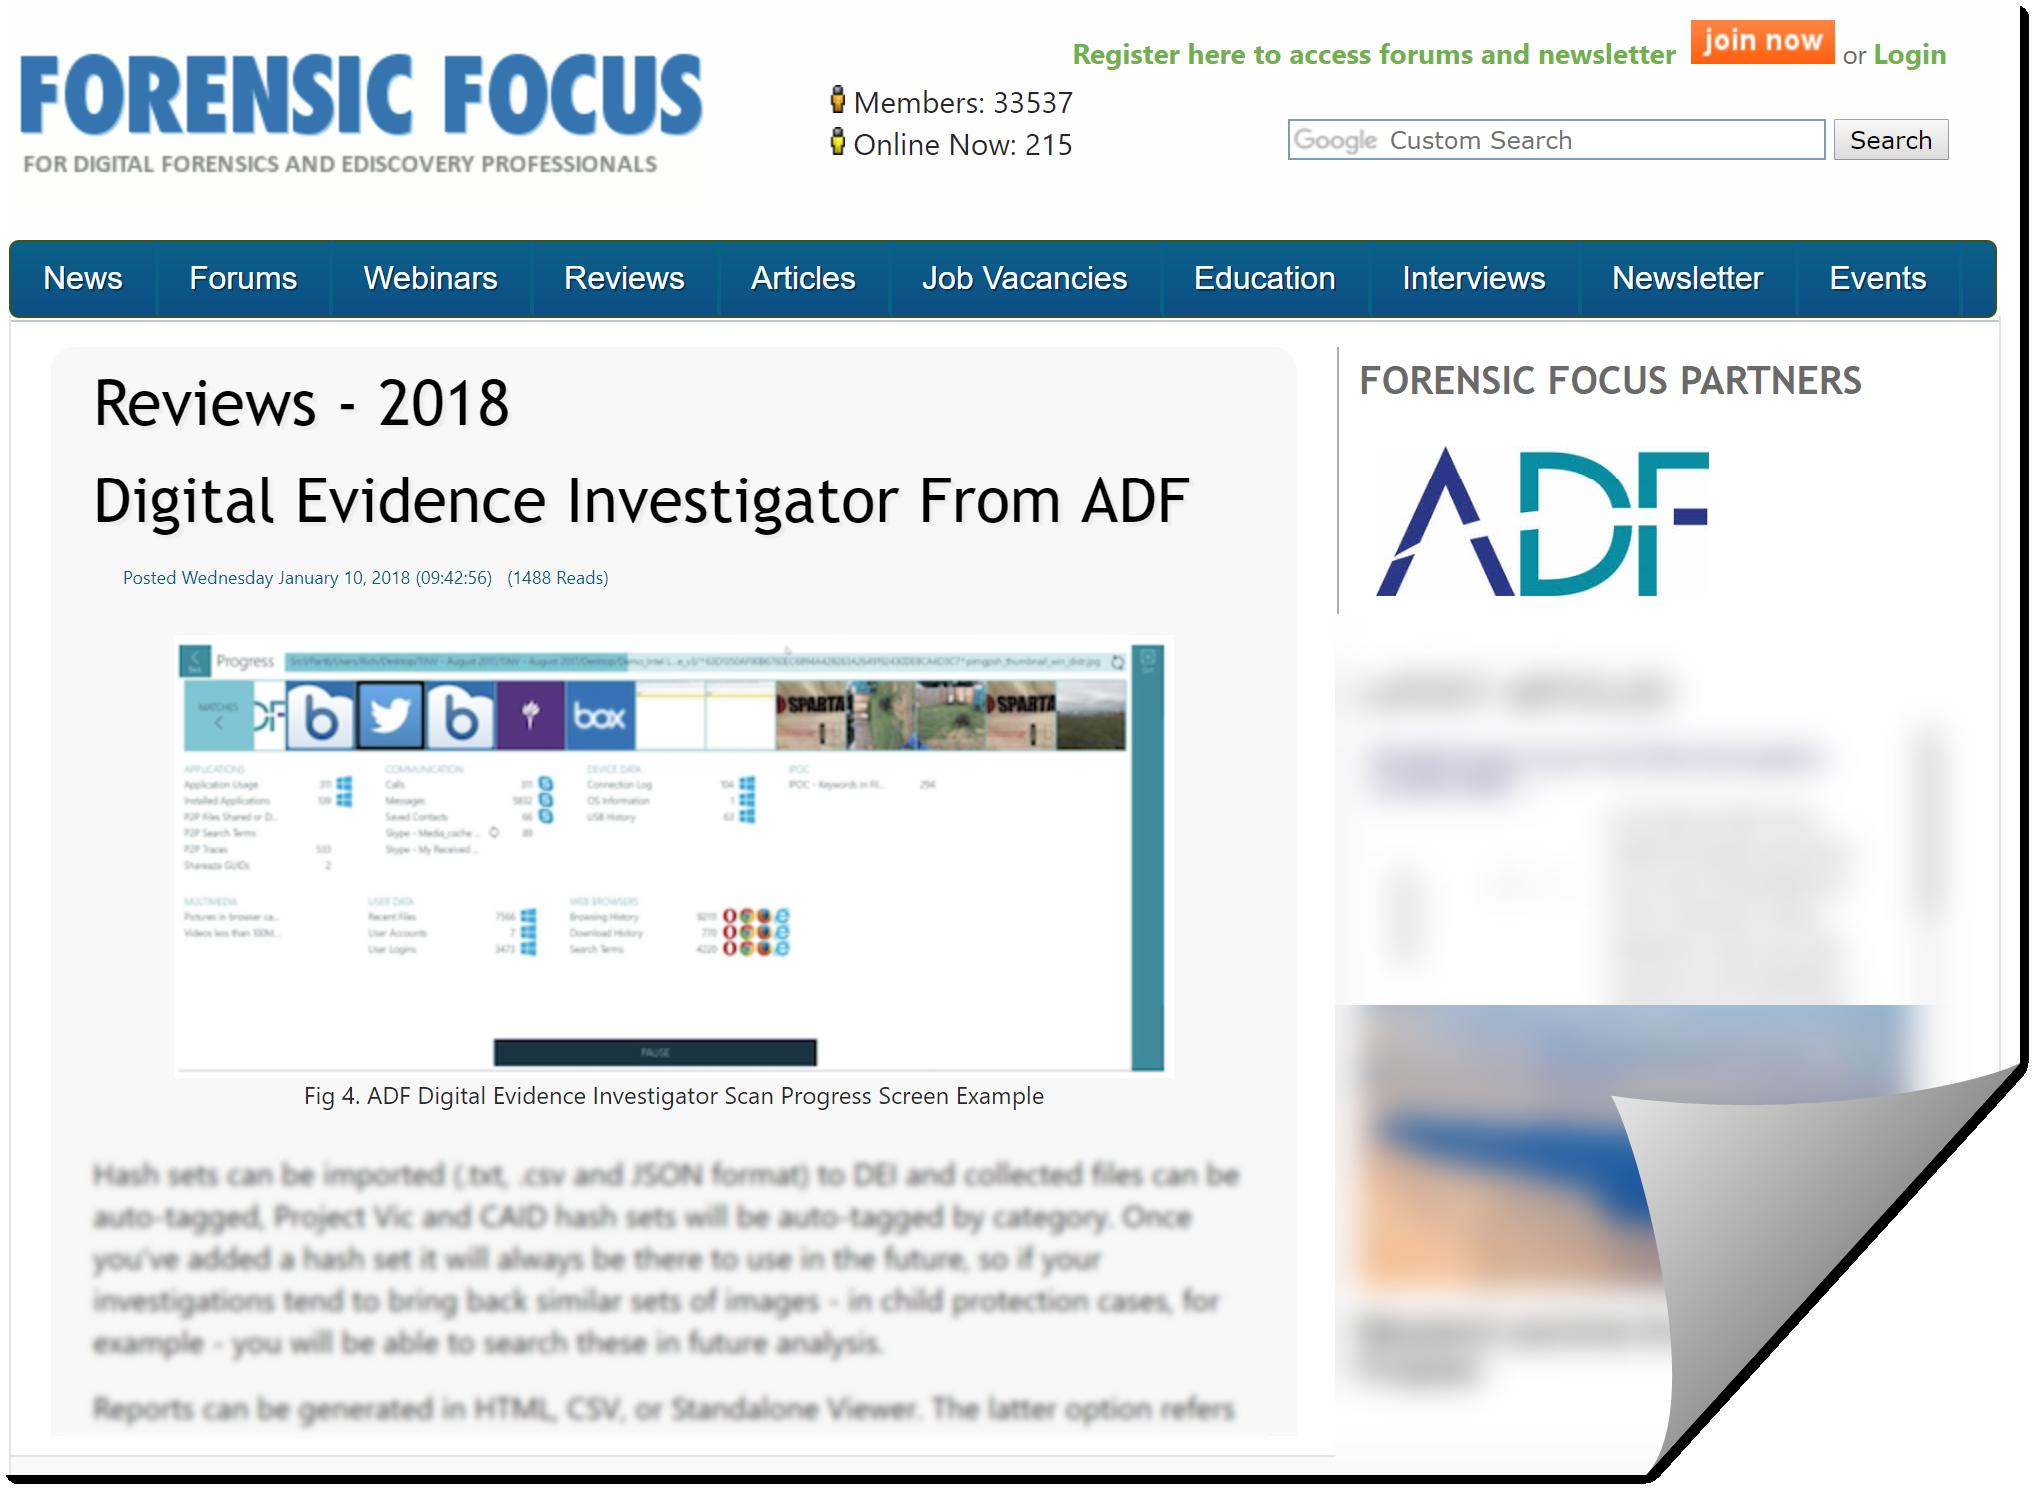 Forensic Focus Reviews Digital Evidence Investigator